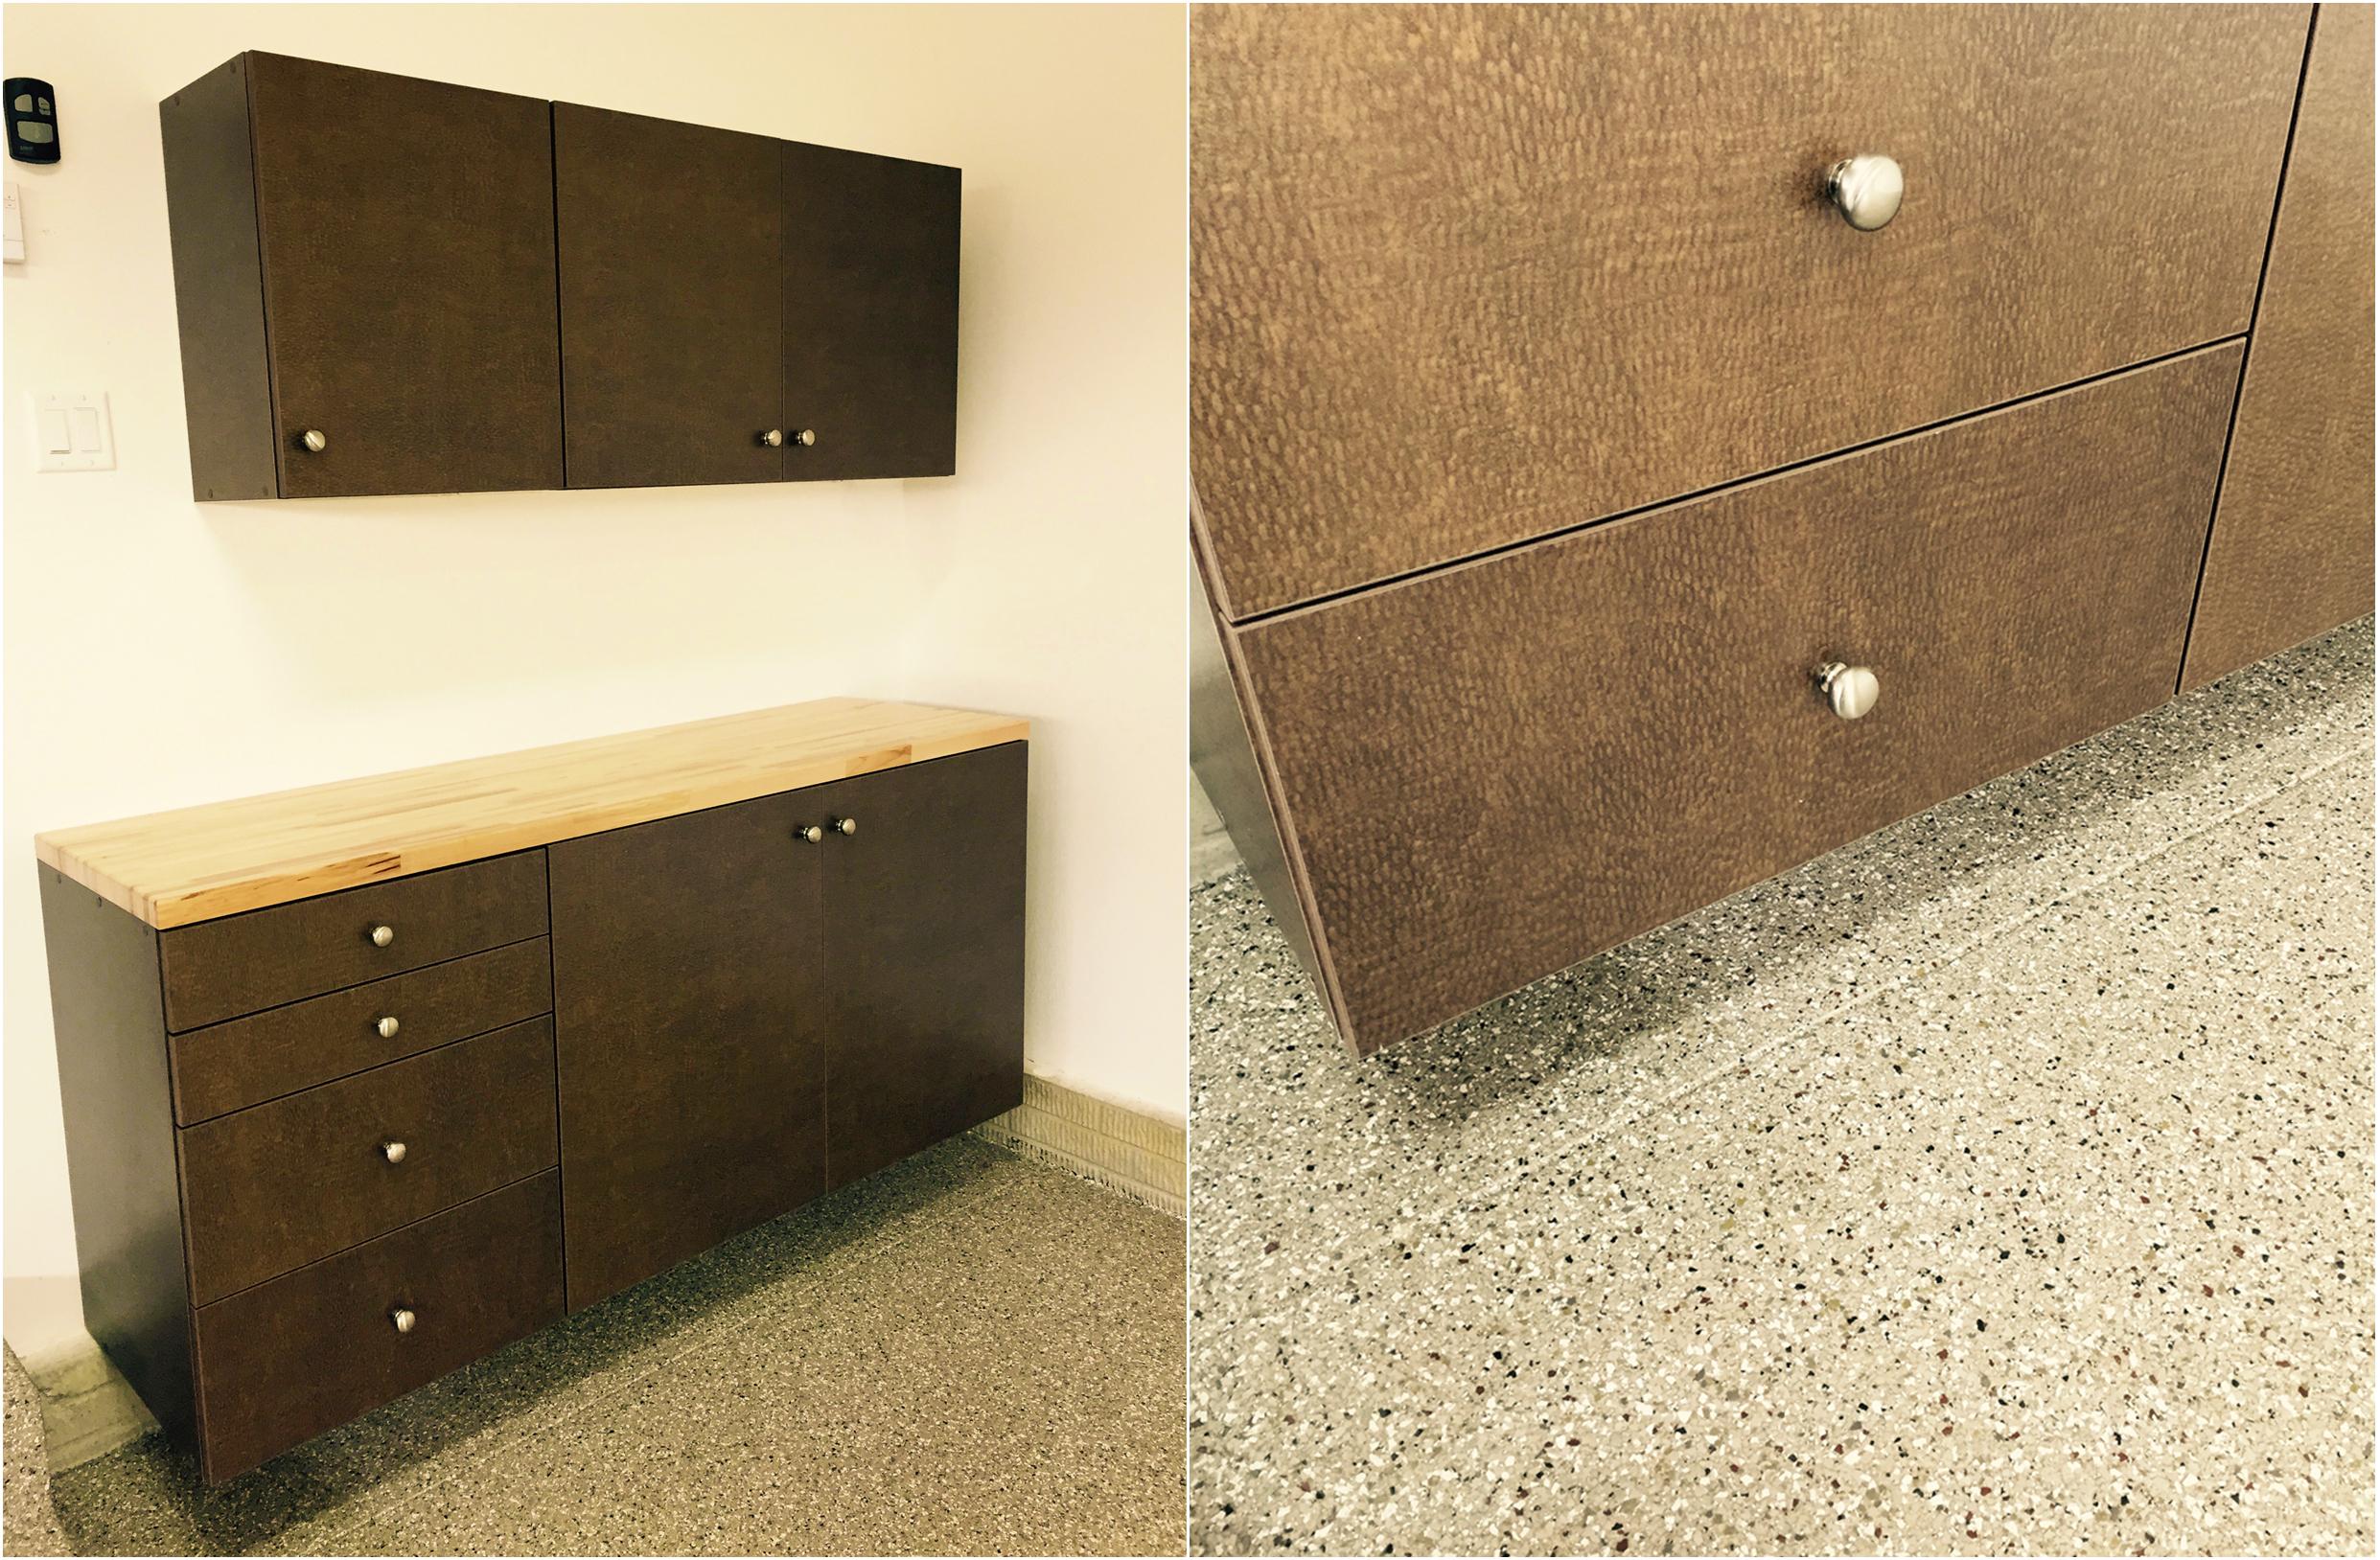 Hudson, OH - Garage Cabinets & Floor